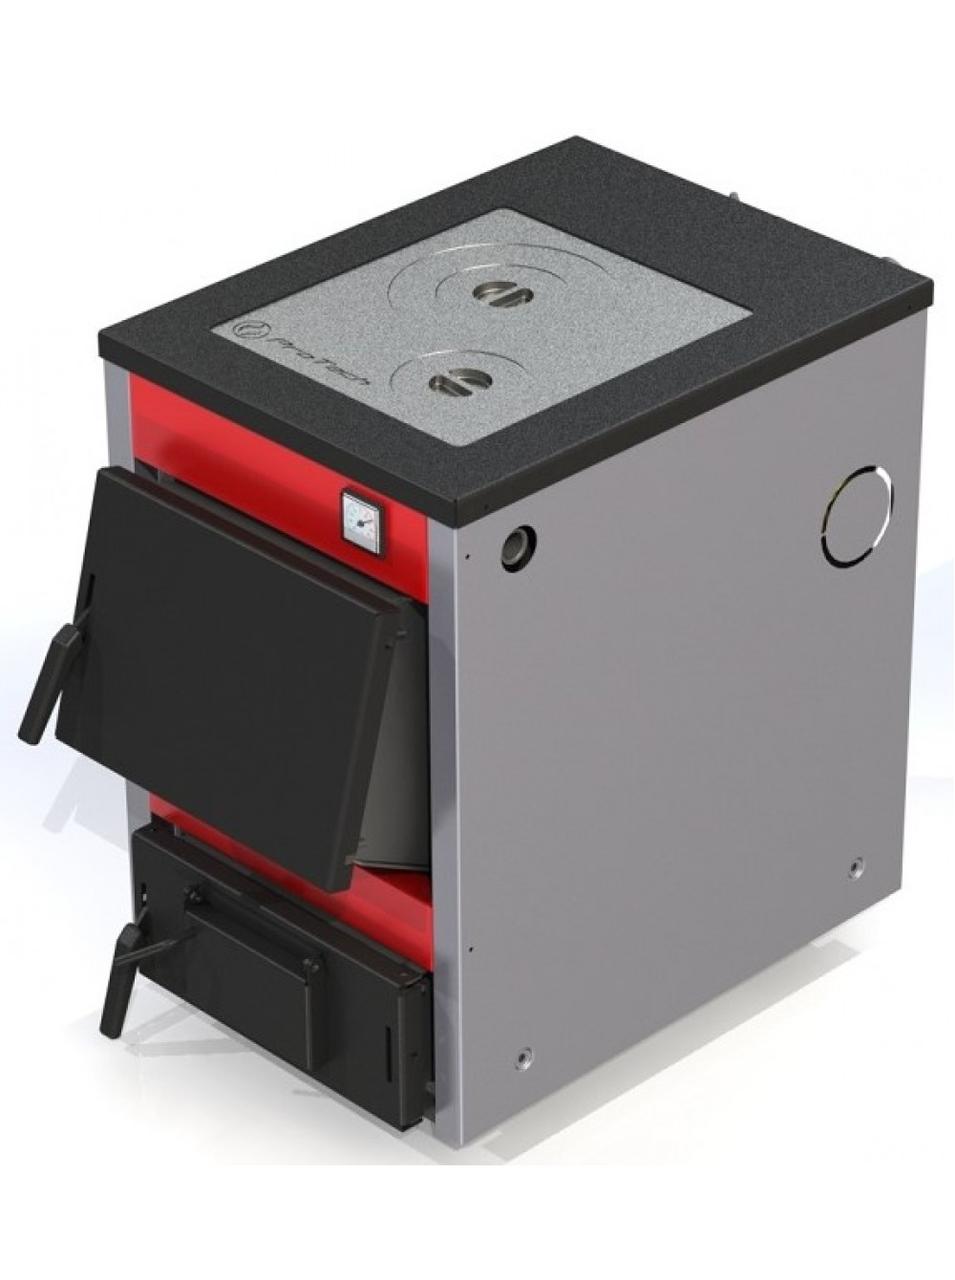 Твердопаливний котел ProTech Стандарт плюс (Standard plus): ТТП - 18 кВт